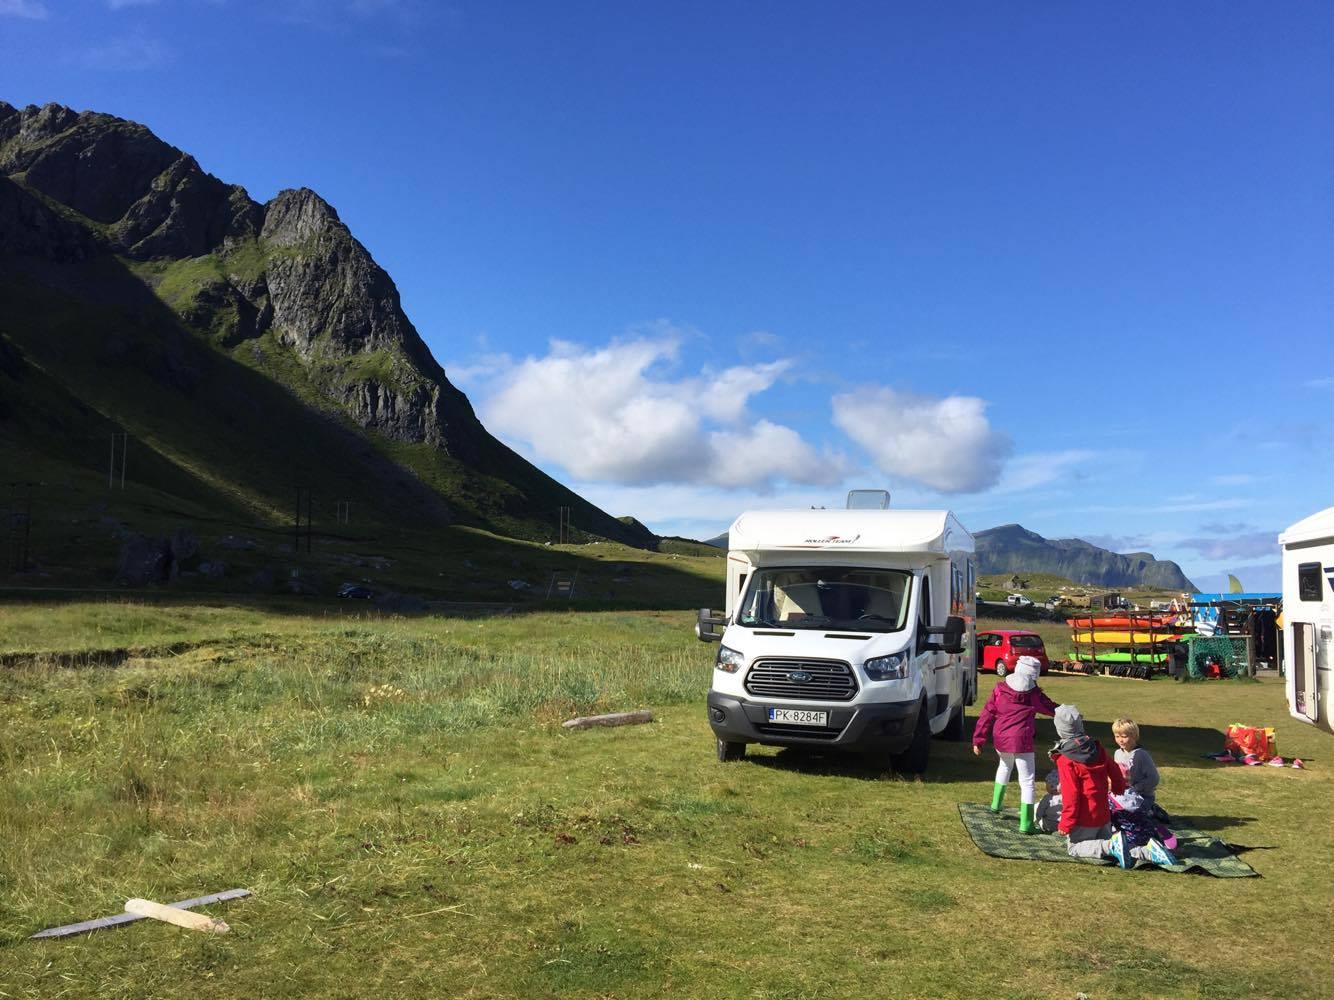 podróż kamperem, ile kosztuje podróż kamperem, kamperem koszty, kamperem po Skandynawii